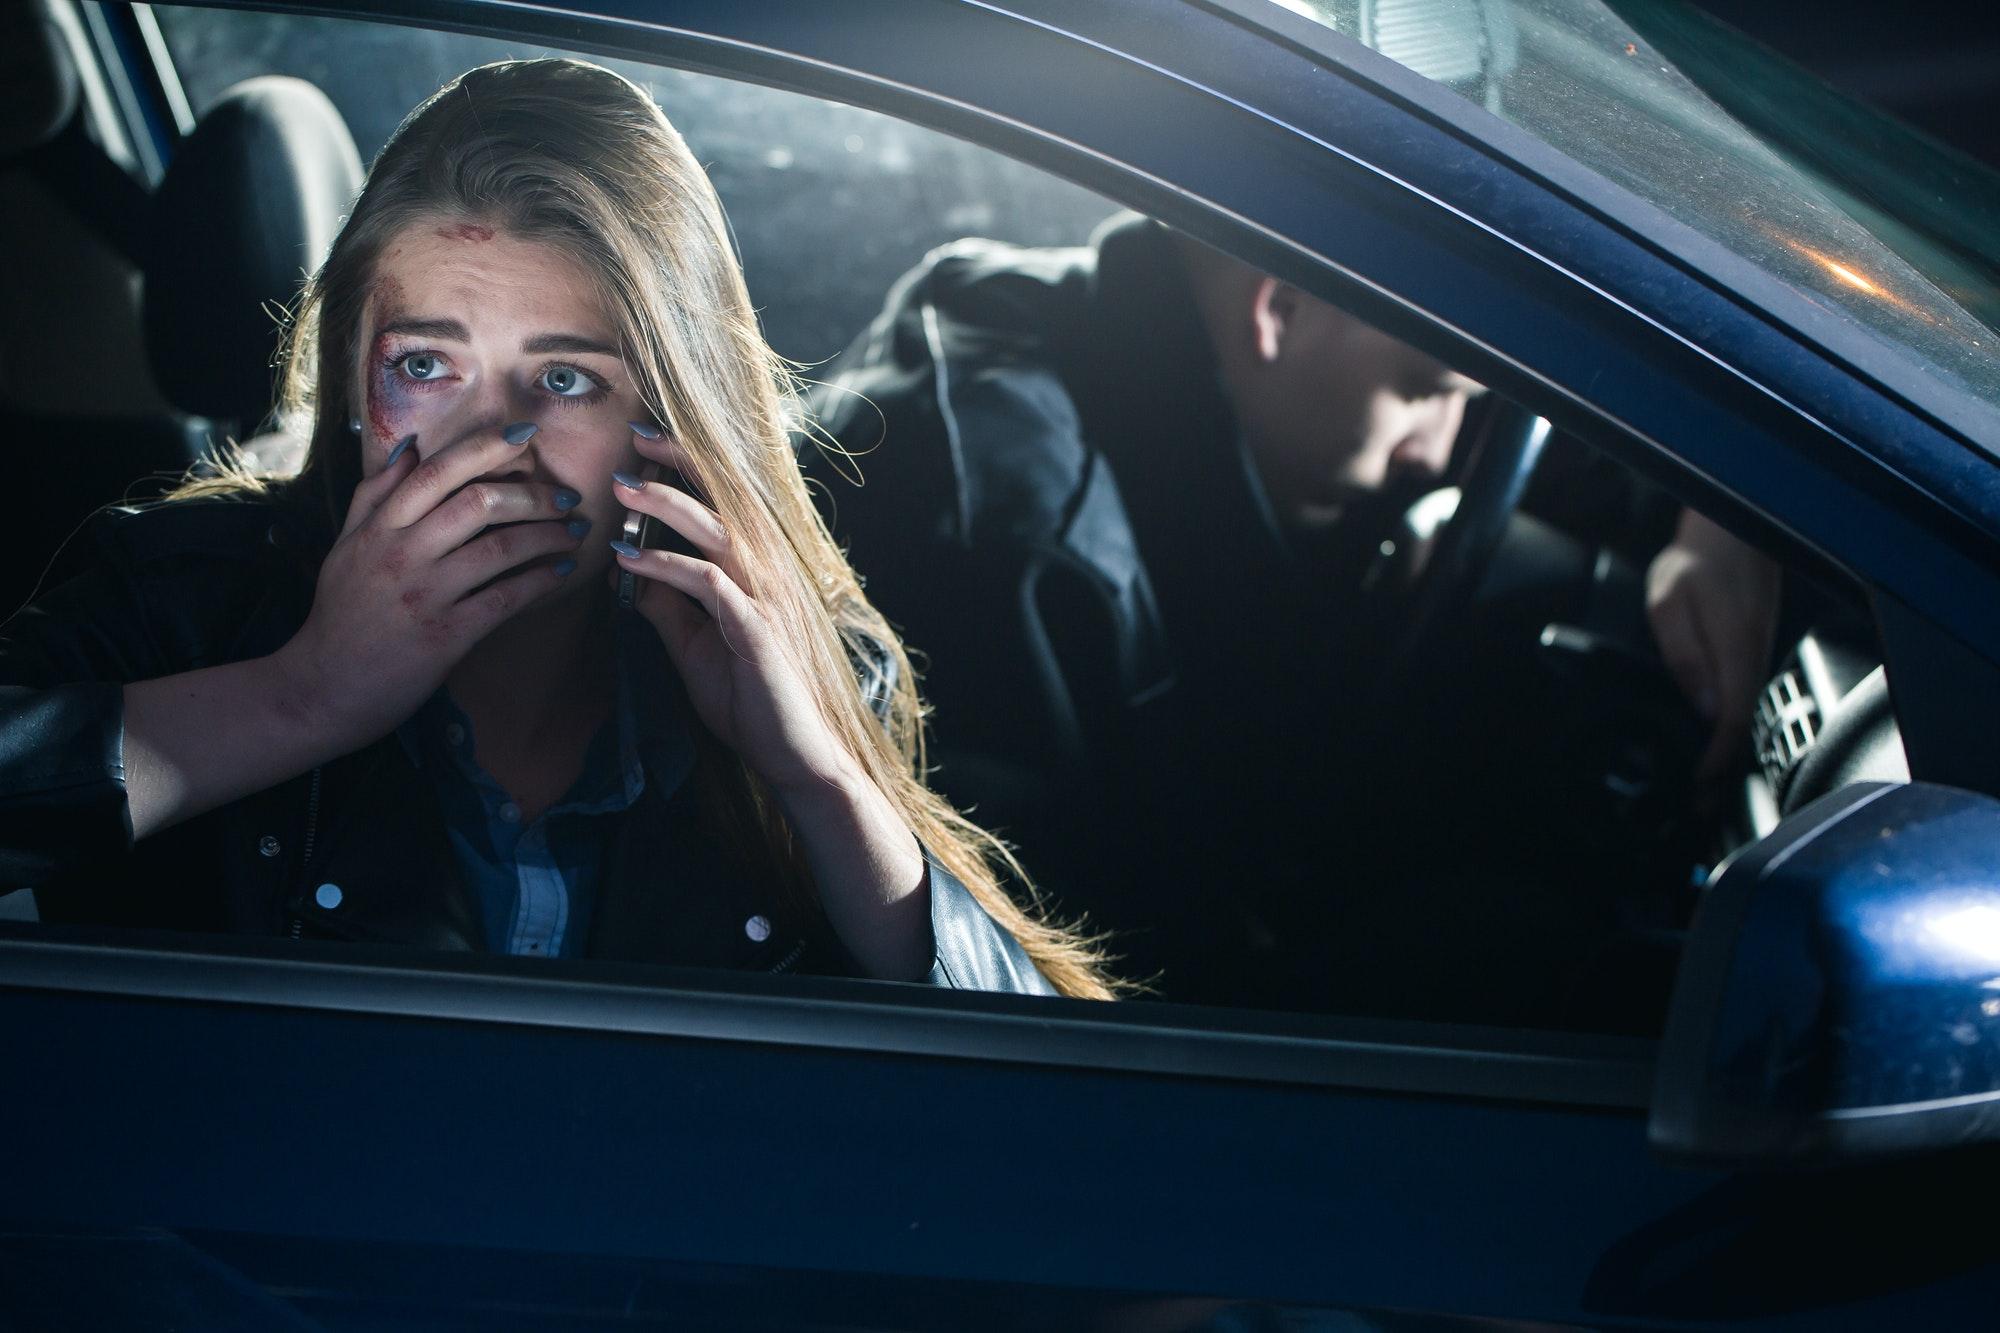 Bleeding traumatized passenger calling for help